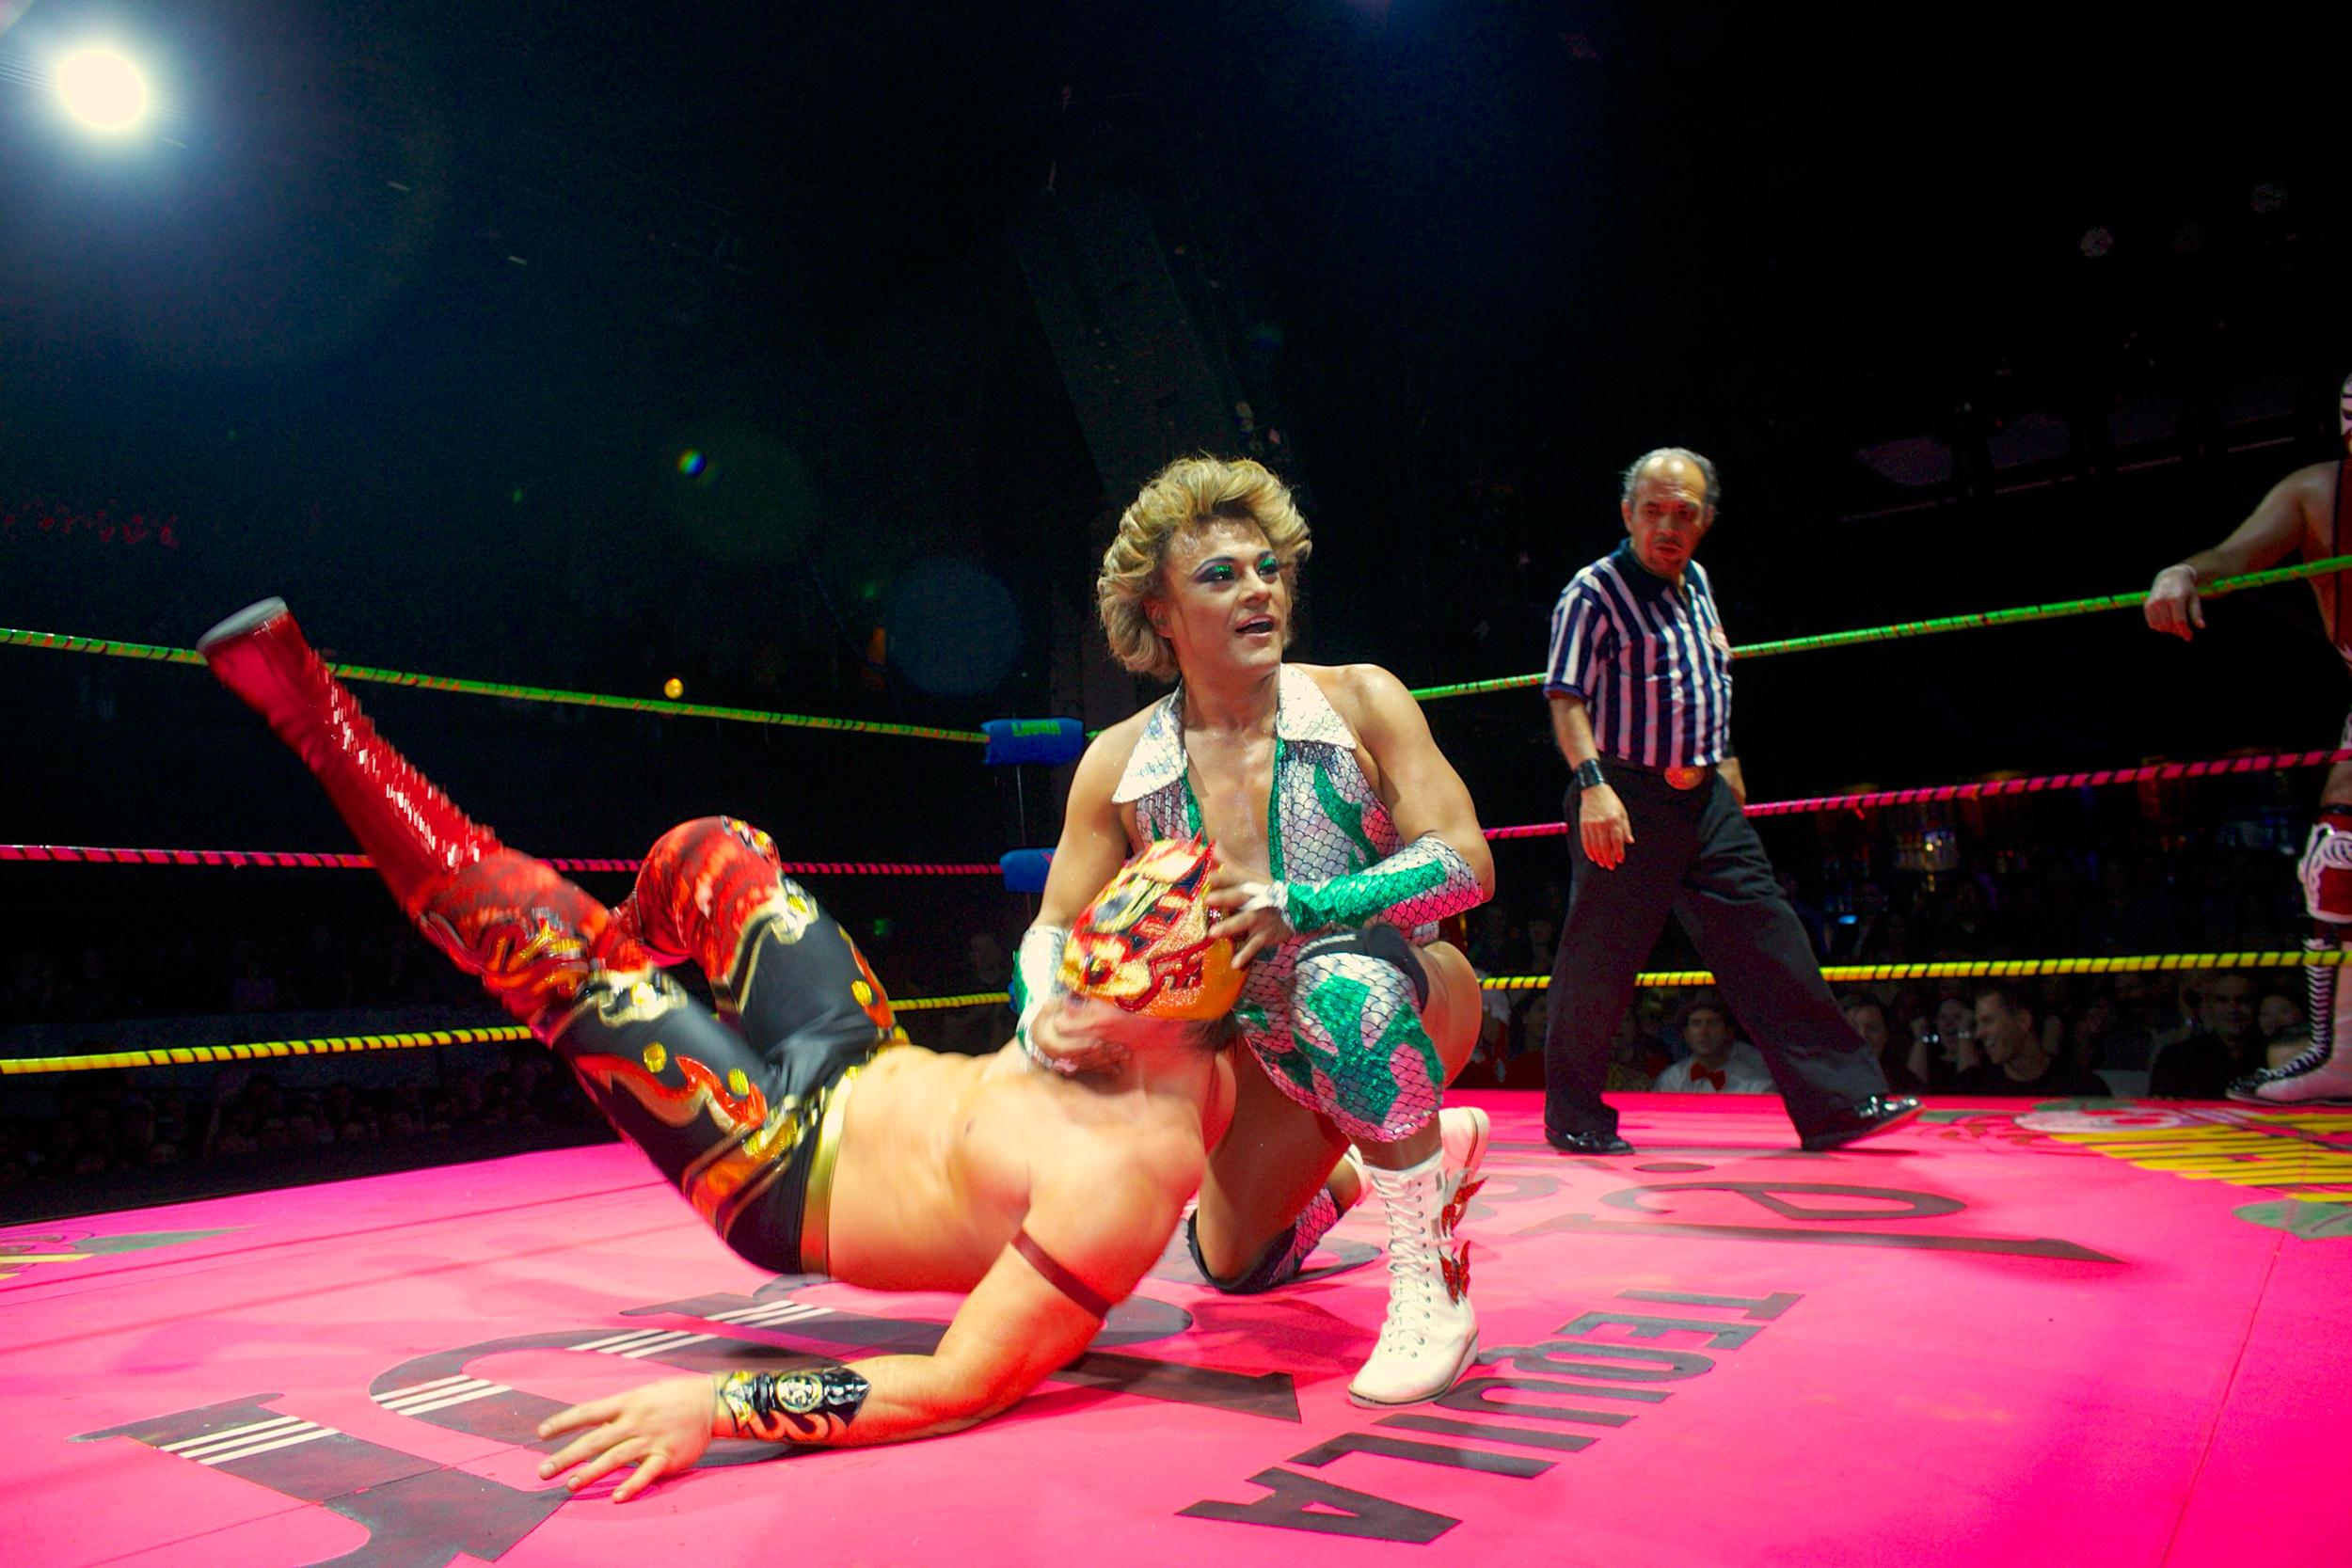 Image: Lucha libre transvestite wrestler Cassandro pulls the mask of wrestler Niebla Roja at the Lucha VaVoom Valentine's show